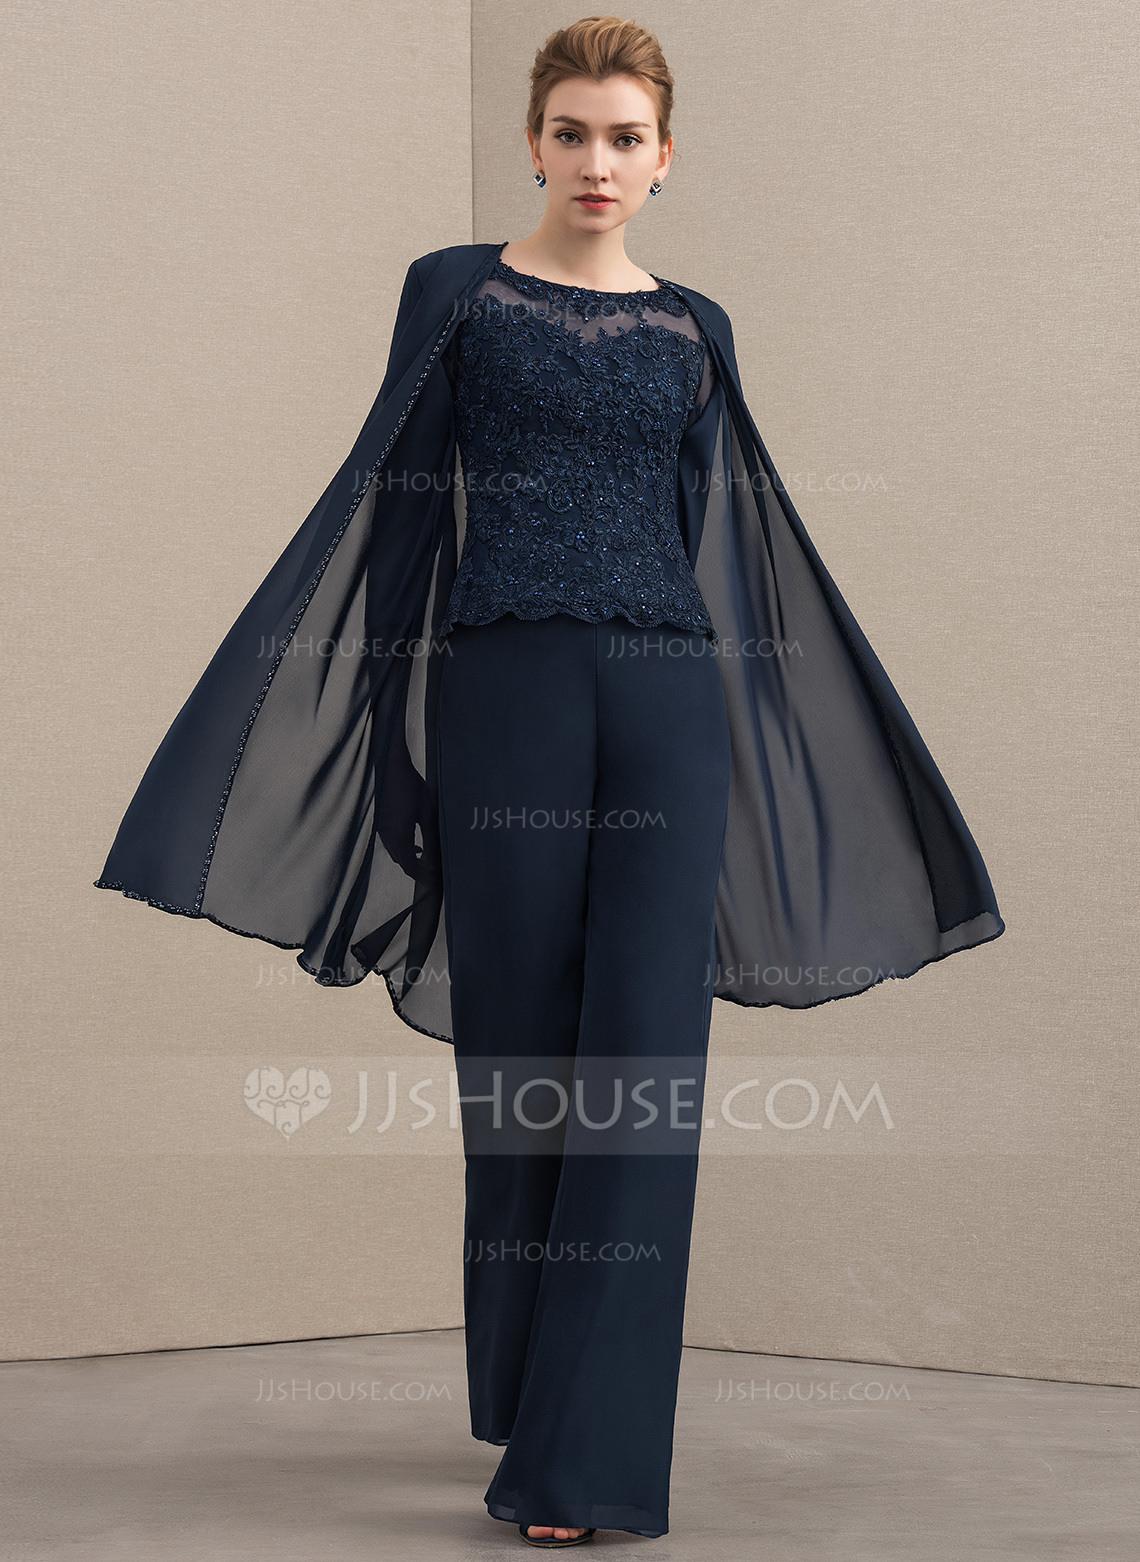 13 Coolste Abendkleid U Ausschnitt Spezialgebiet13 Einzigartig Abendkleid U Ausschnitt Vertrieb